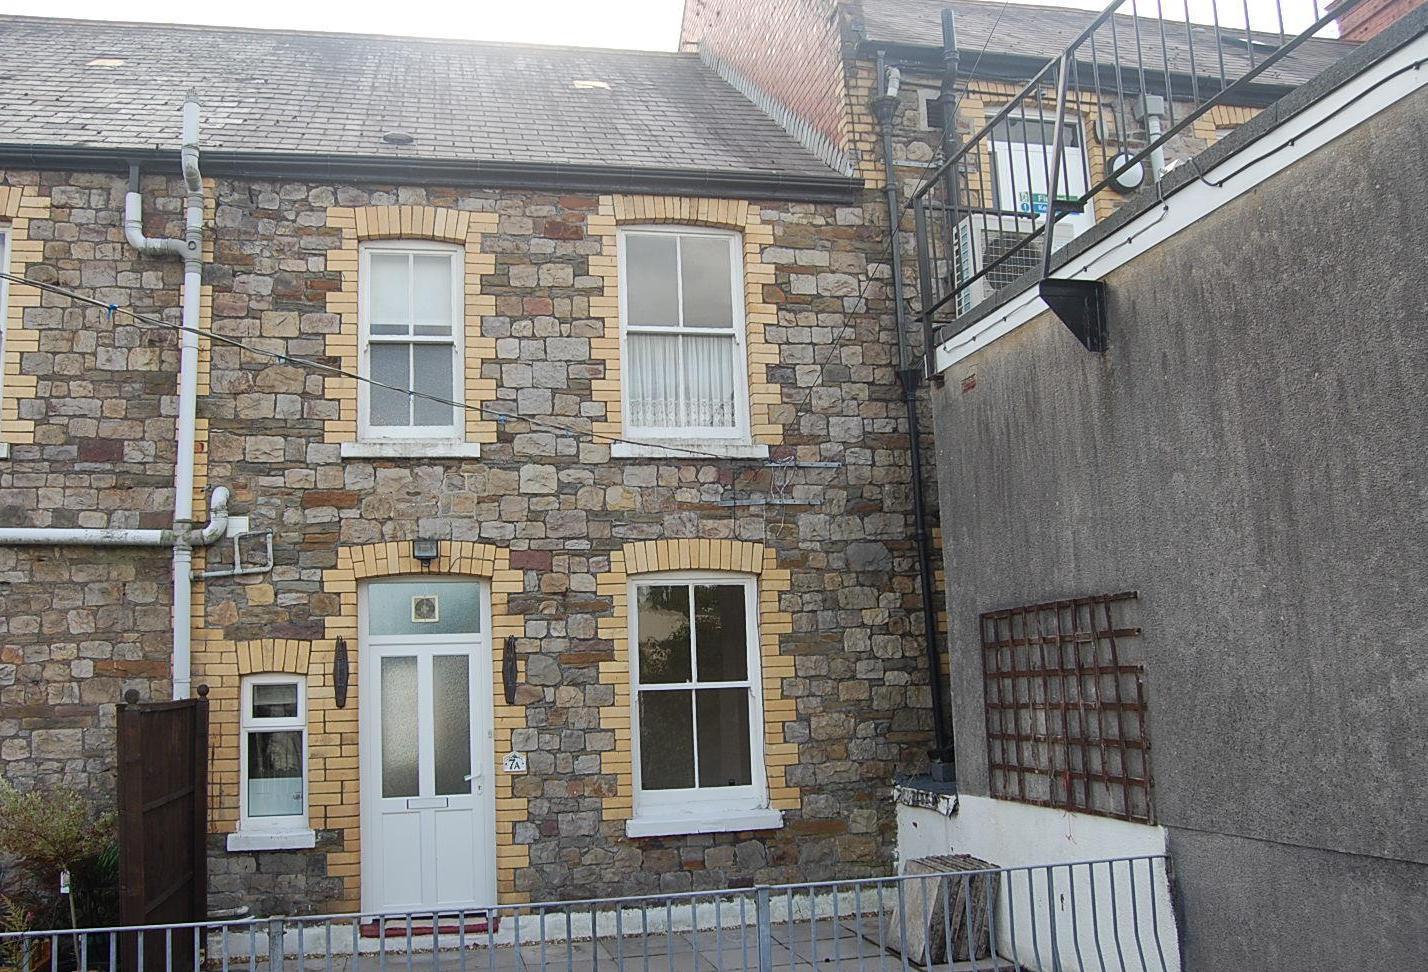 7a College Street, Ammanford, Carmarthenshire